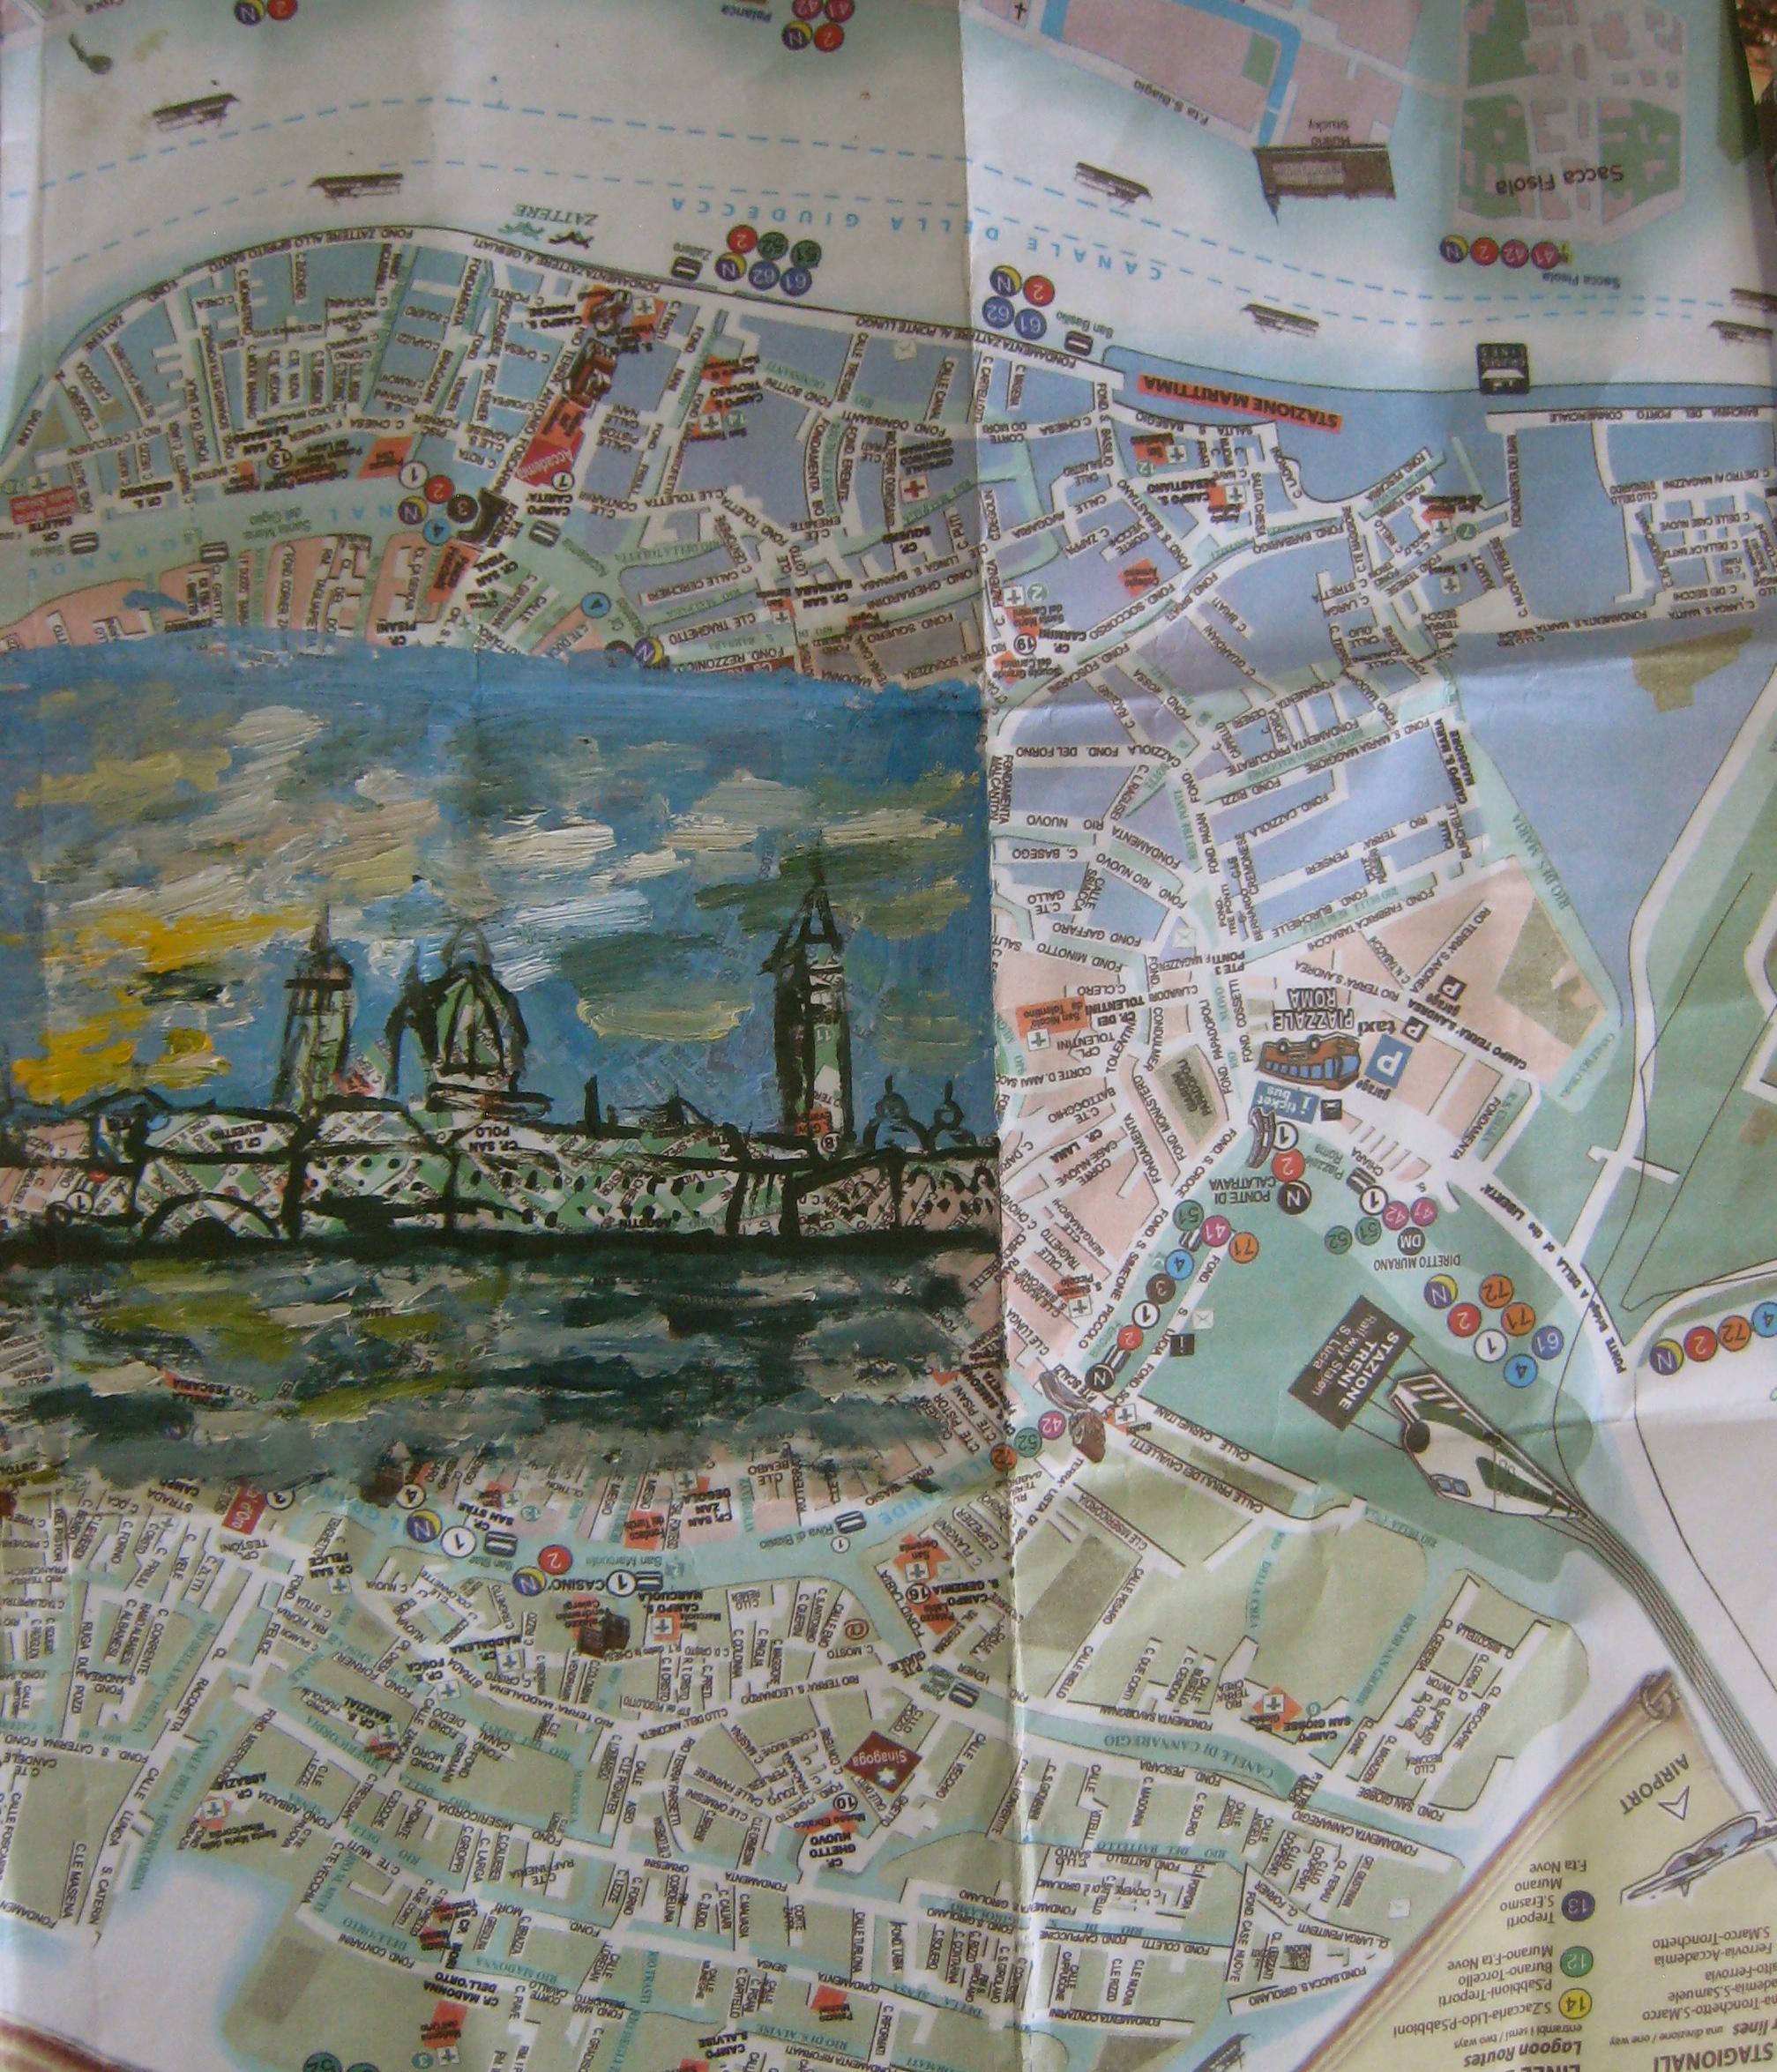 Olivia Pasquarelli, oil on found map of Venice